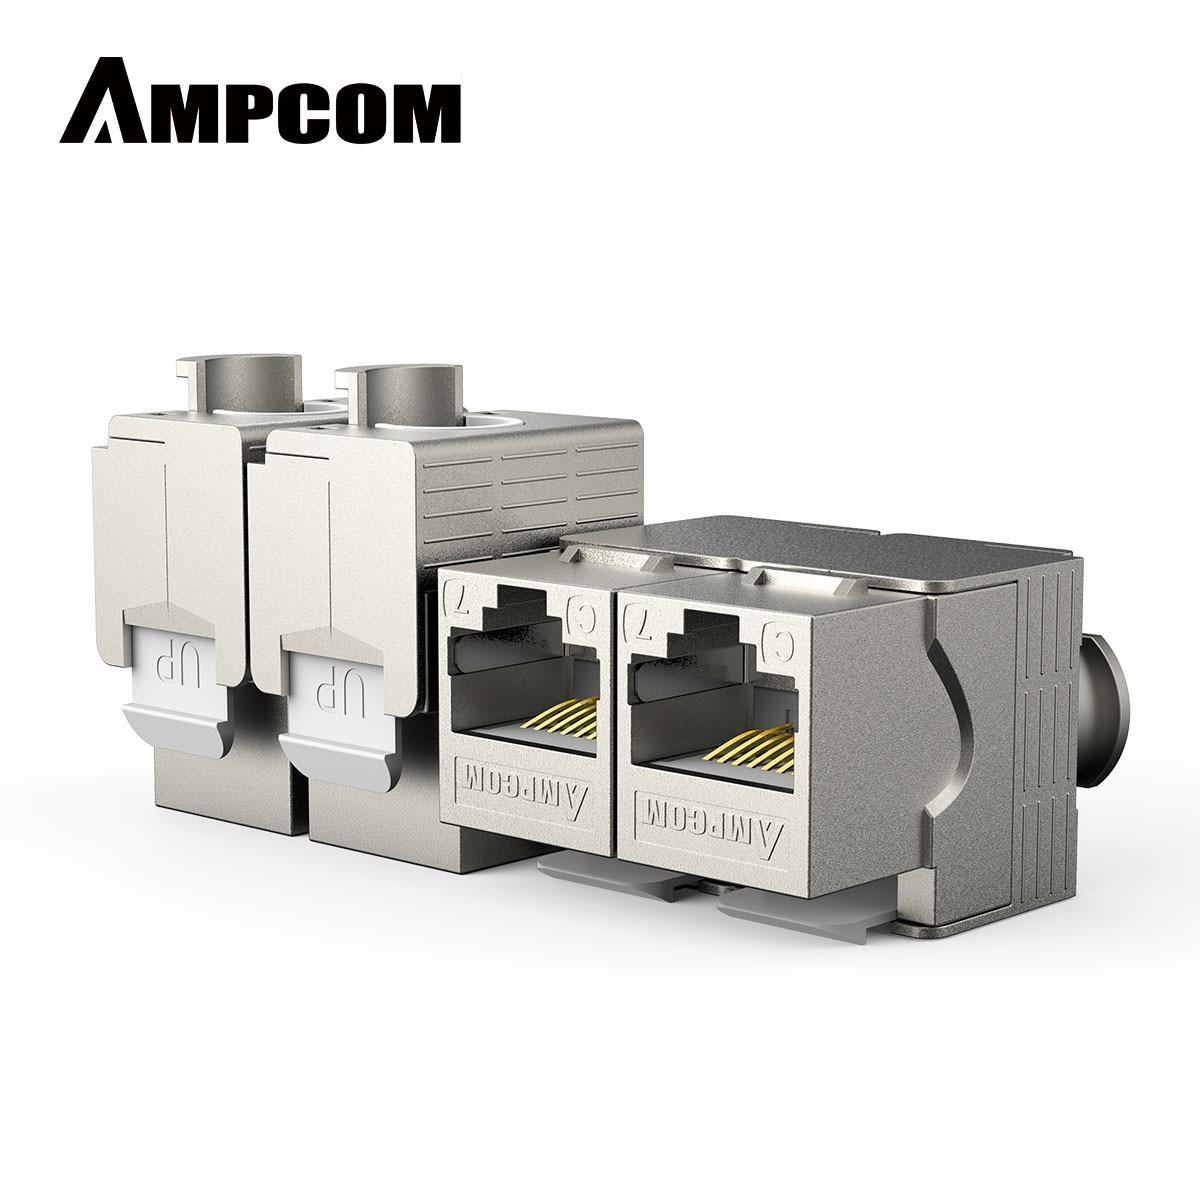 RJ45 CAT 7 Tool-Less STP Shielded Keystone Jack, AMPCOM Self-Locking Cat7 Keystone Zinc Alloy Module Coupler Adapter Wall Plate